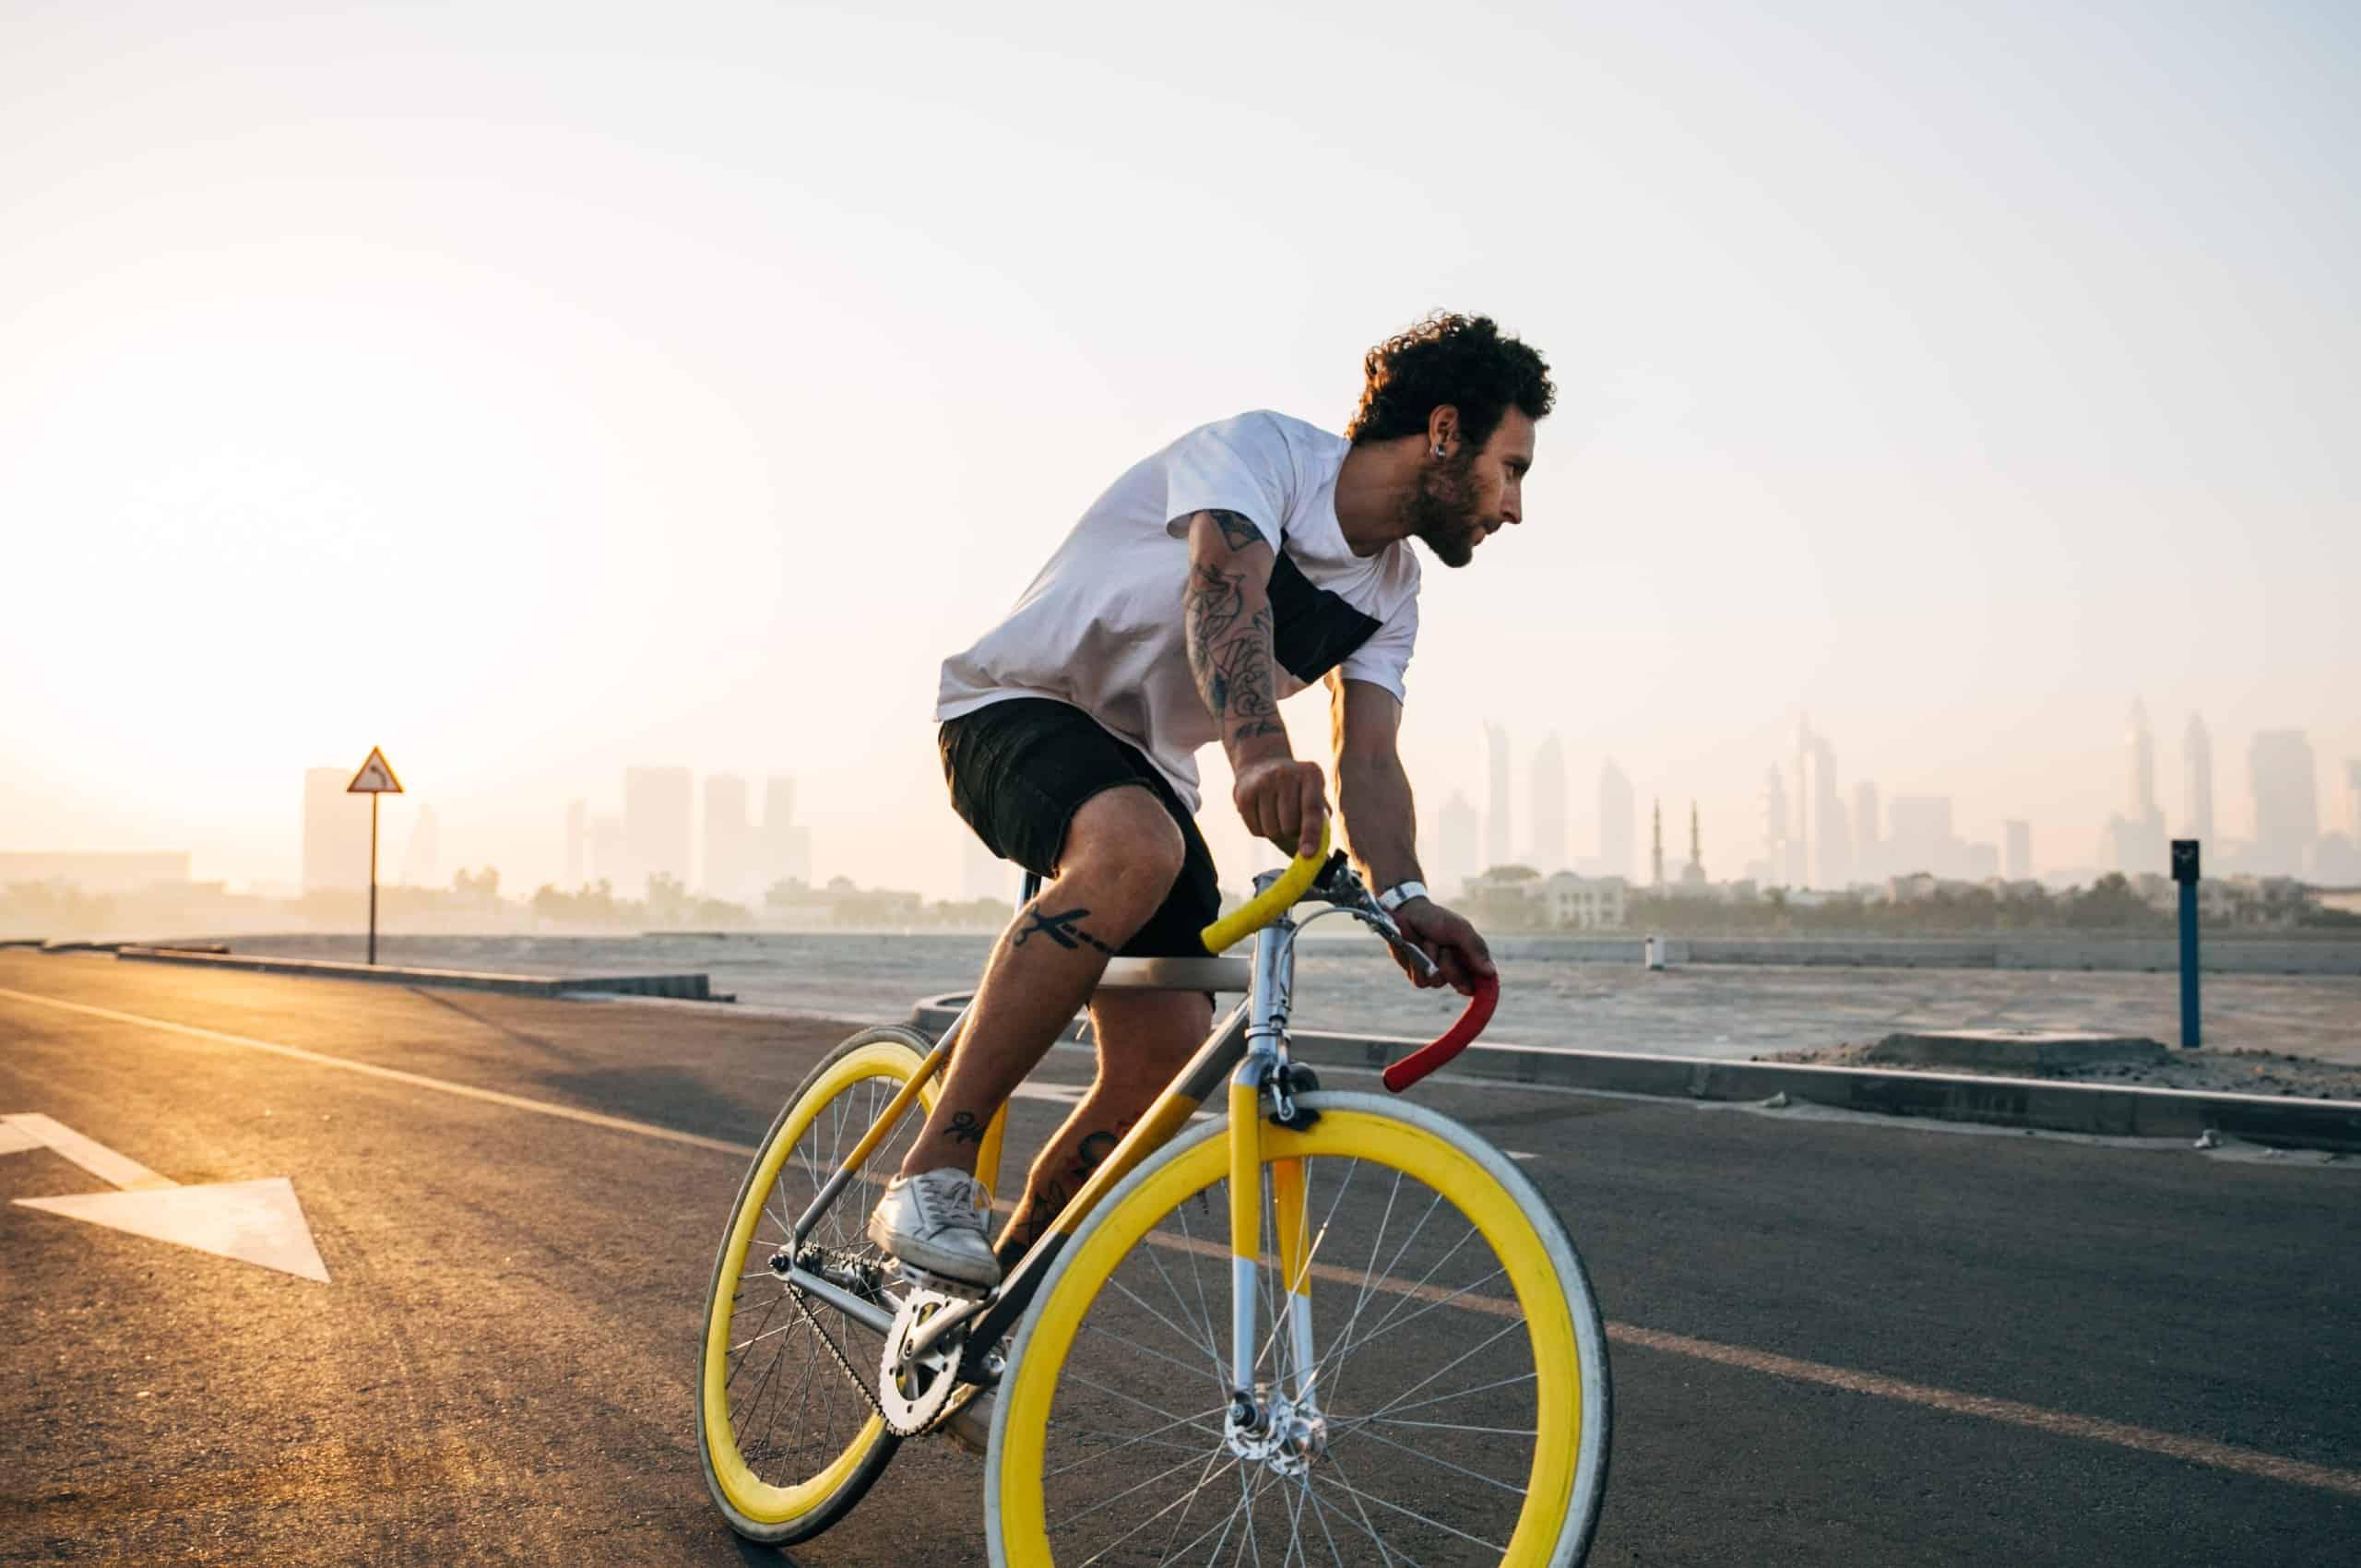 cykeln till jobbet